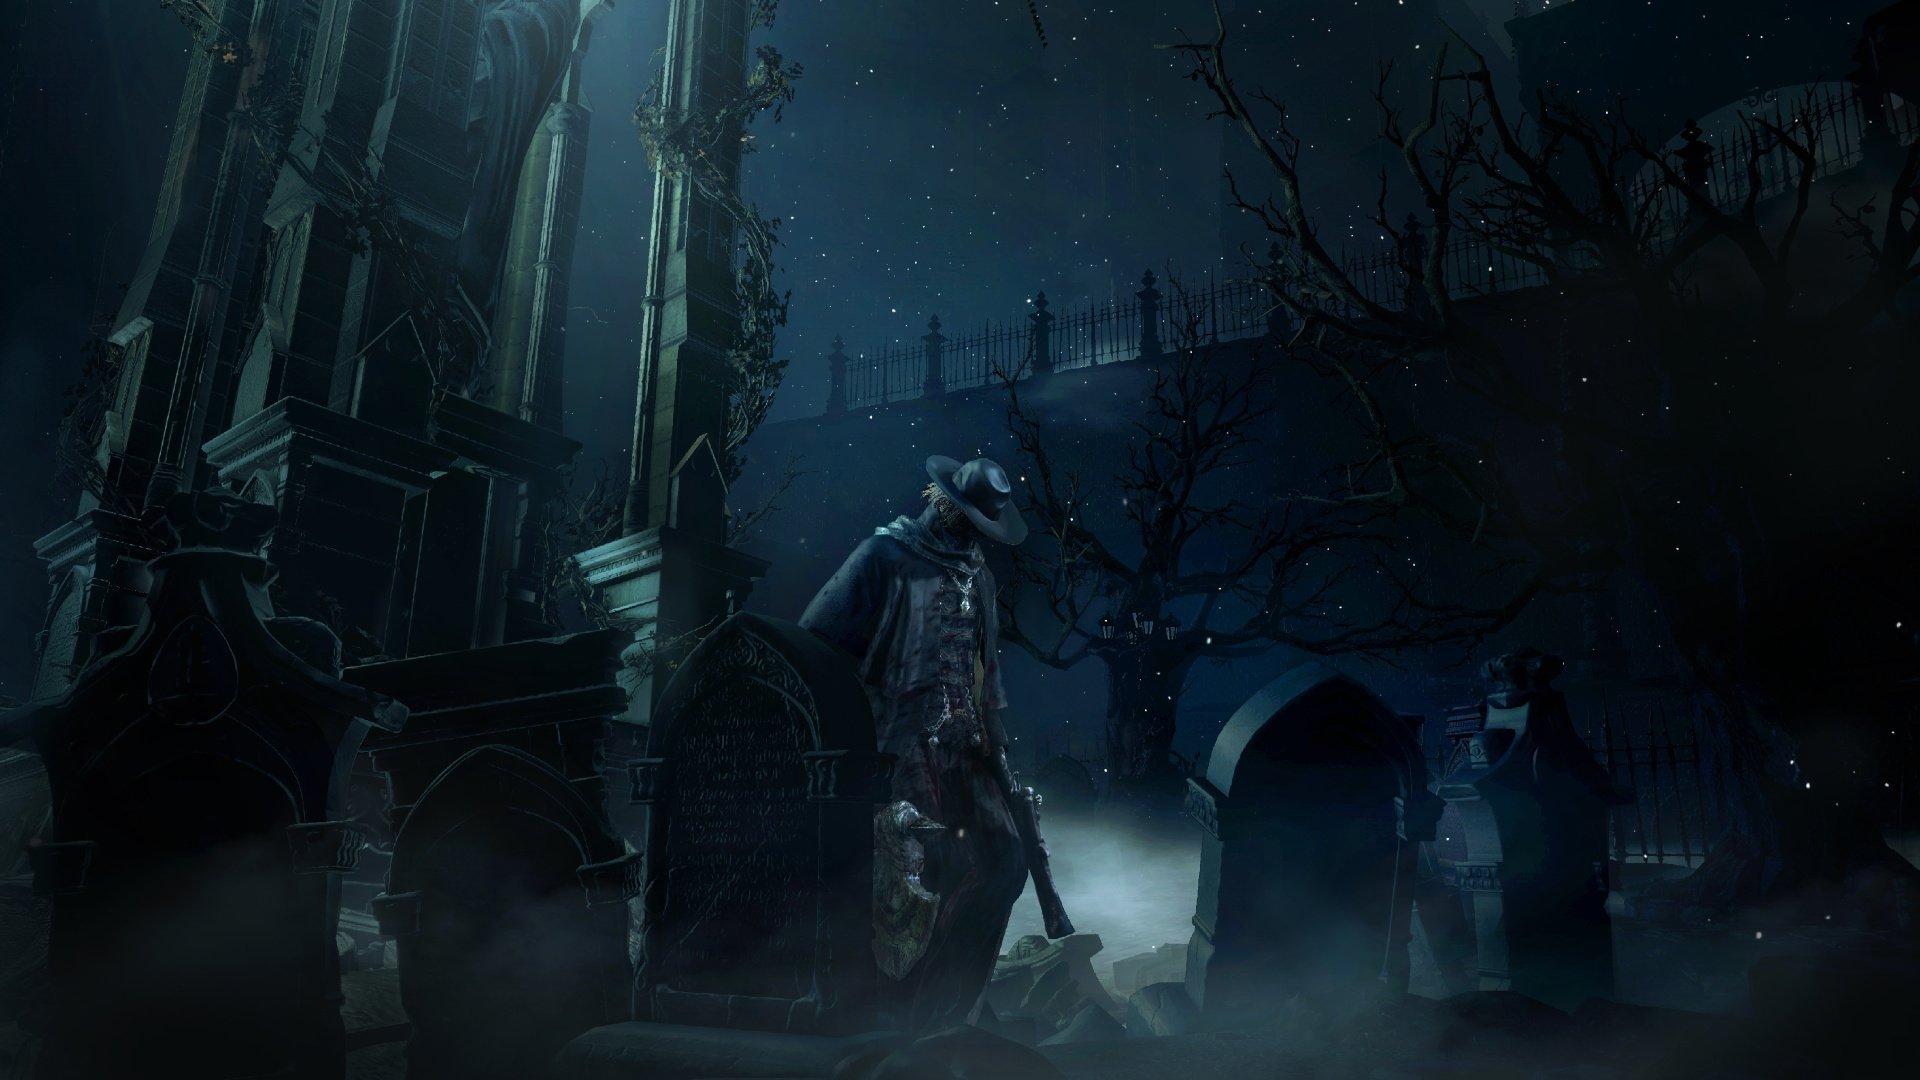 Bloodborne full hd wallpaper and background 1920x1080 - Bloodborne download ...